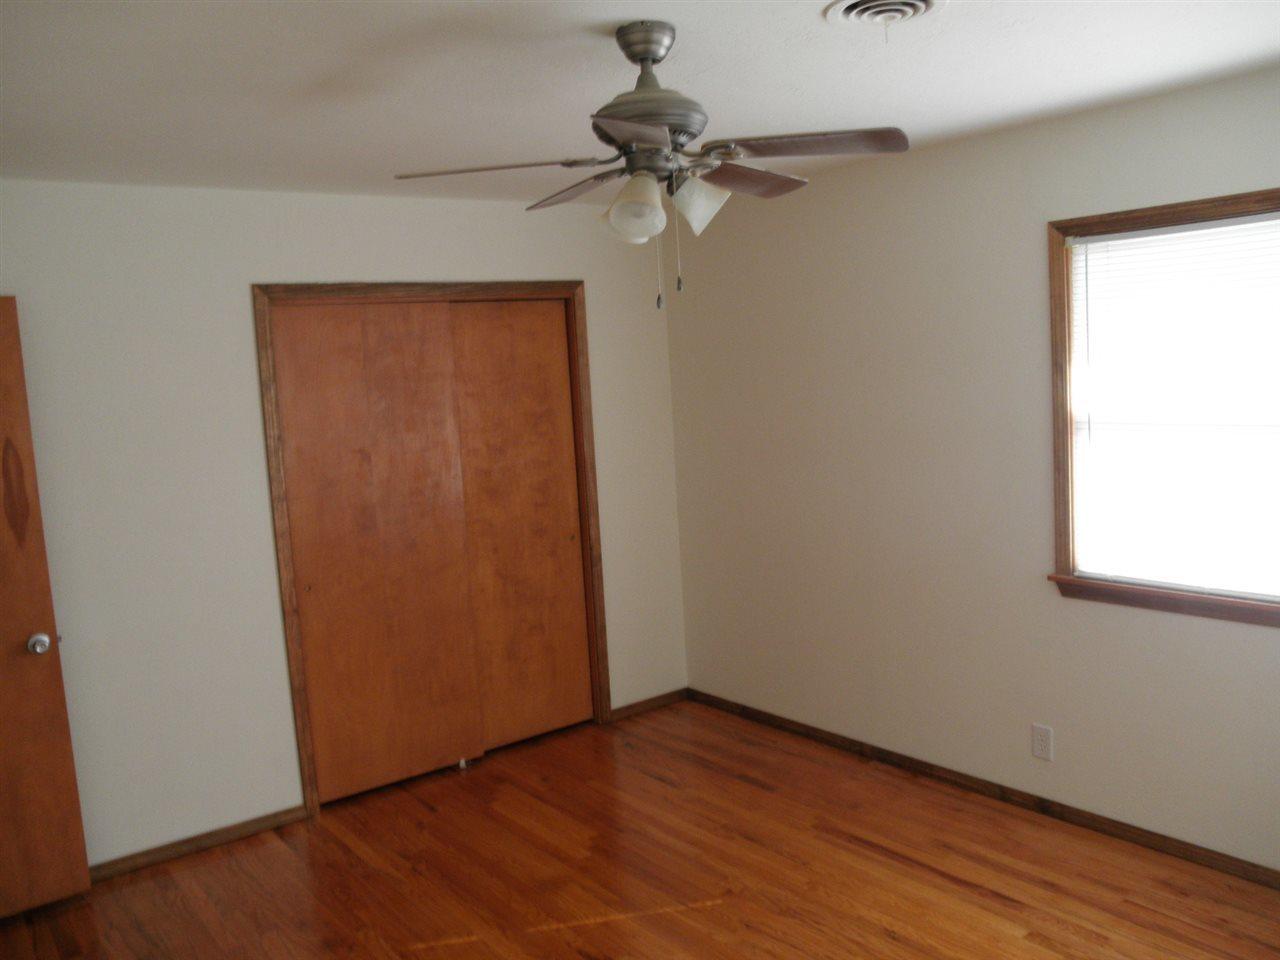 Sold Cross Sale W/ MLS   204 N 13th  Ponca City, OK 74601 11